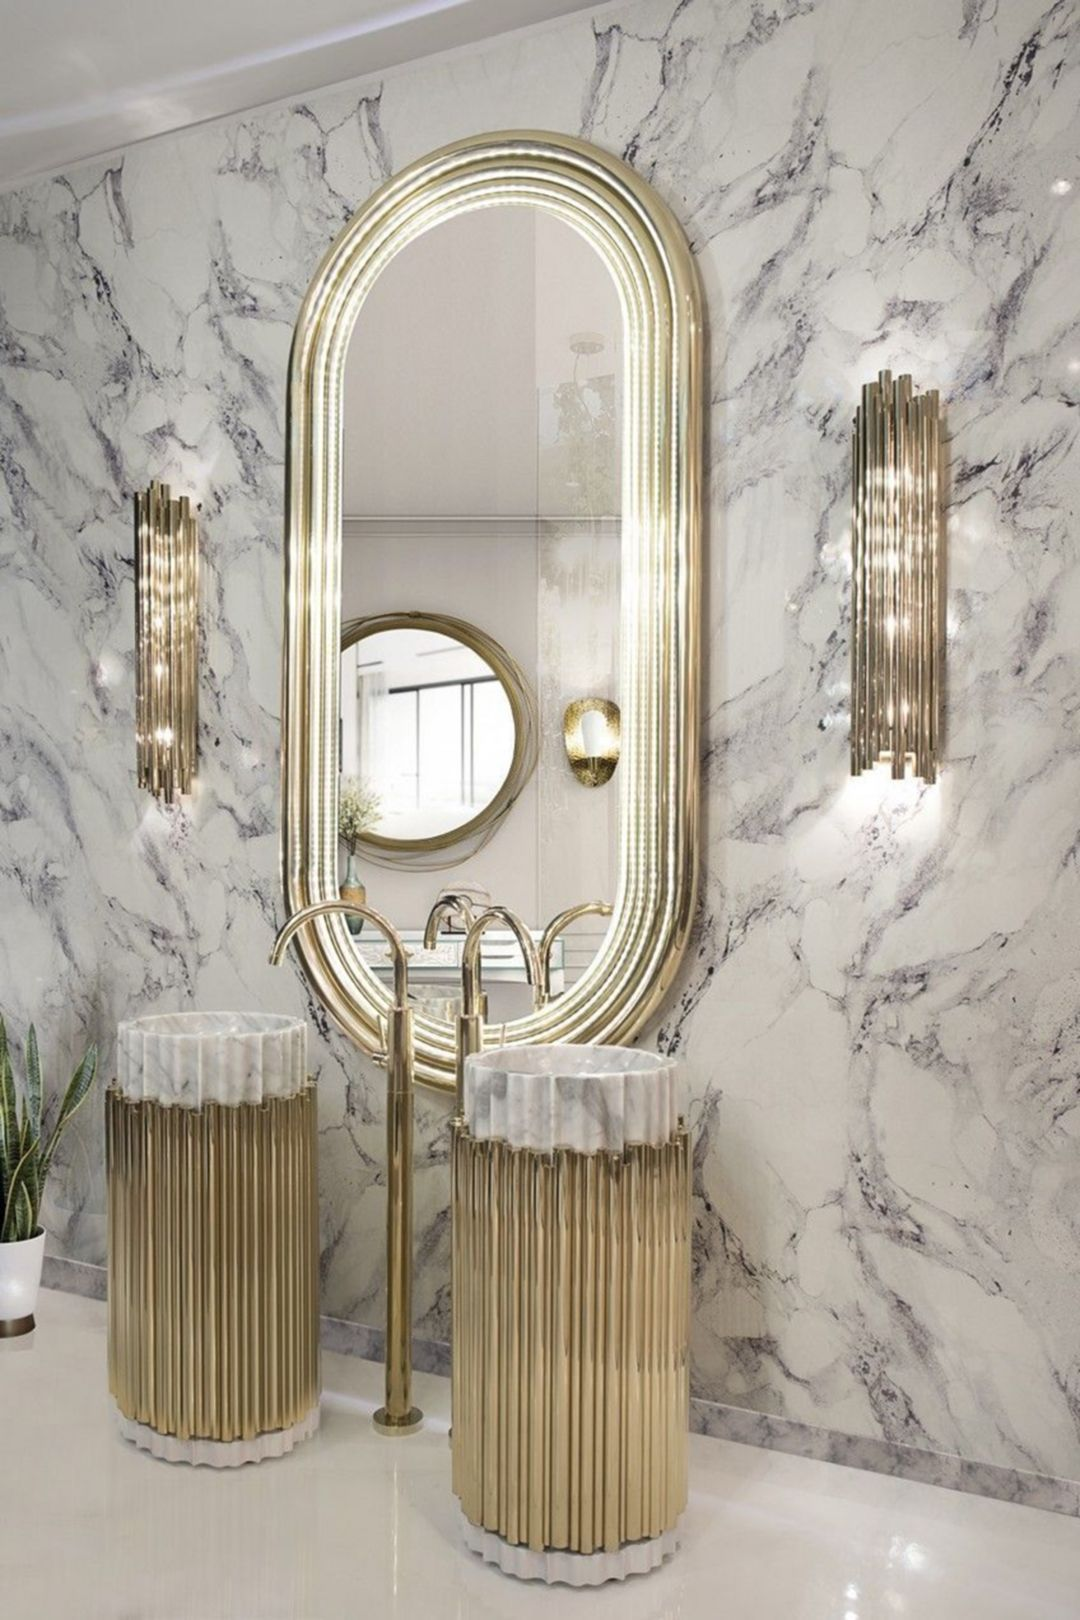 #Bath #Bathroom #Comfort #Decorating #Enchanting #Feel